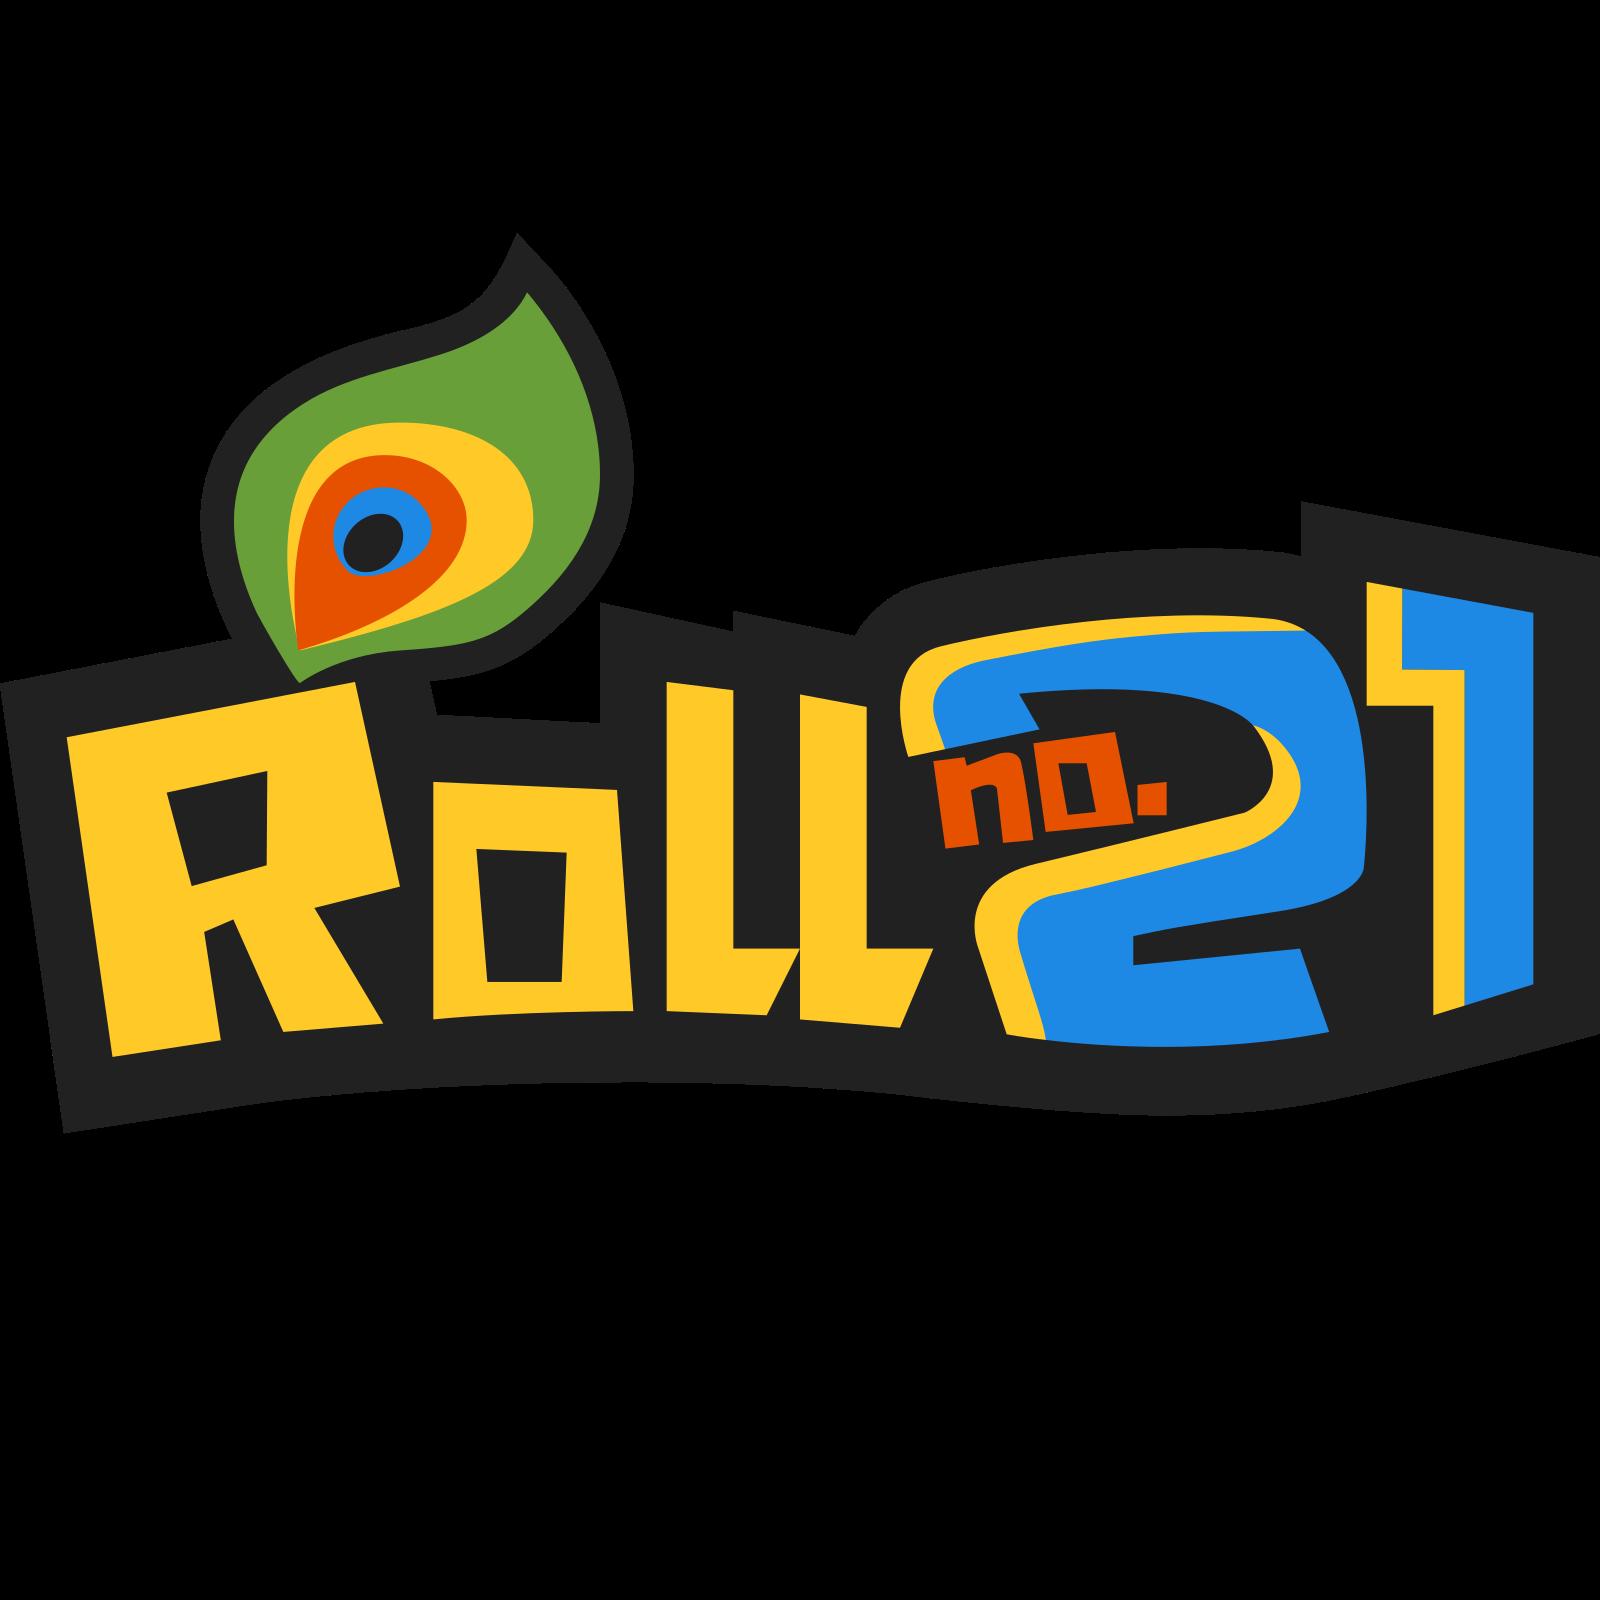 Rouleau n ° 21 icon